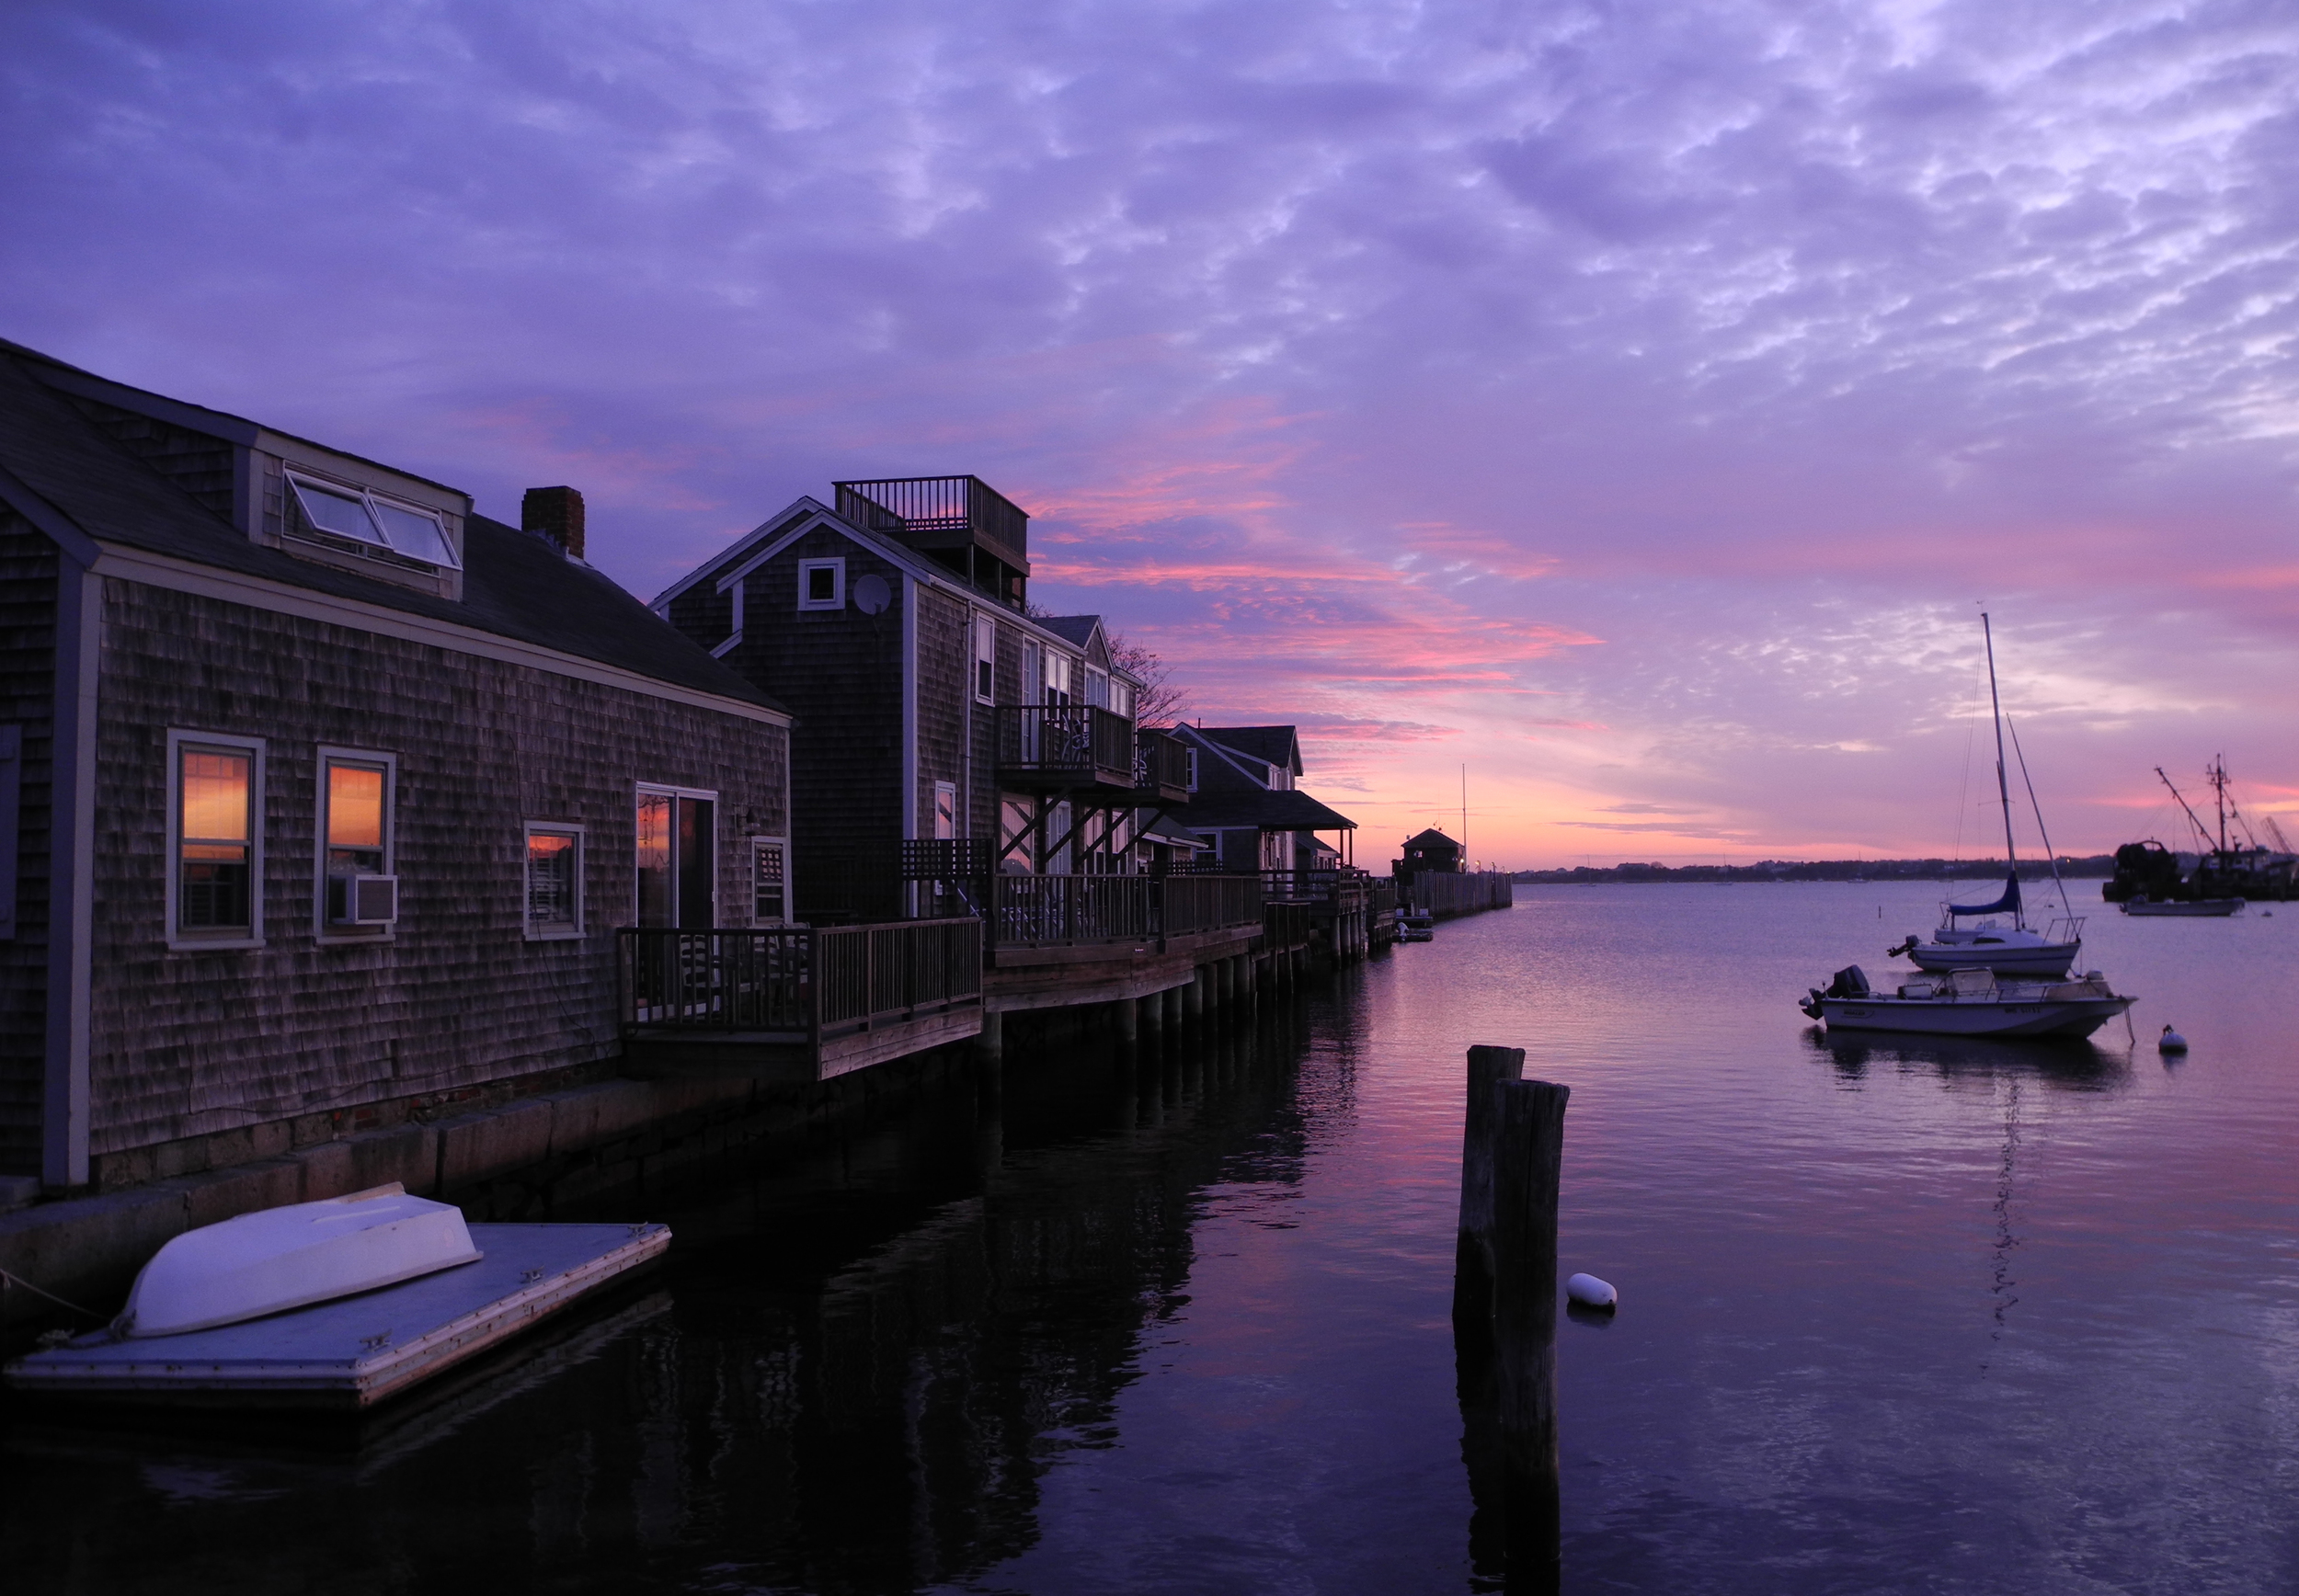 Travel: Nantucket sunrise